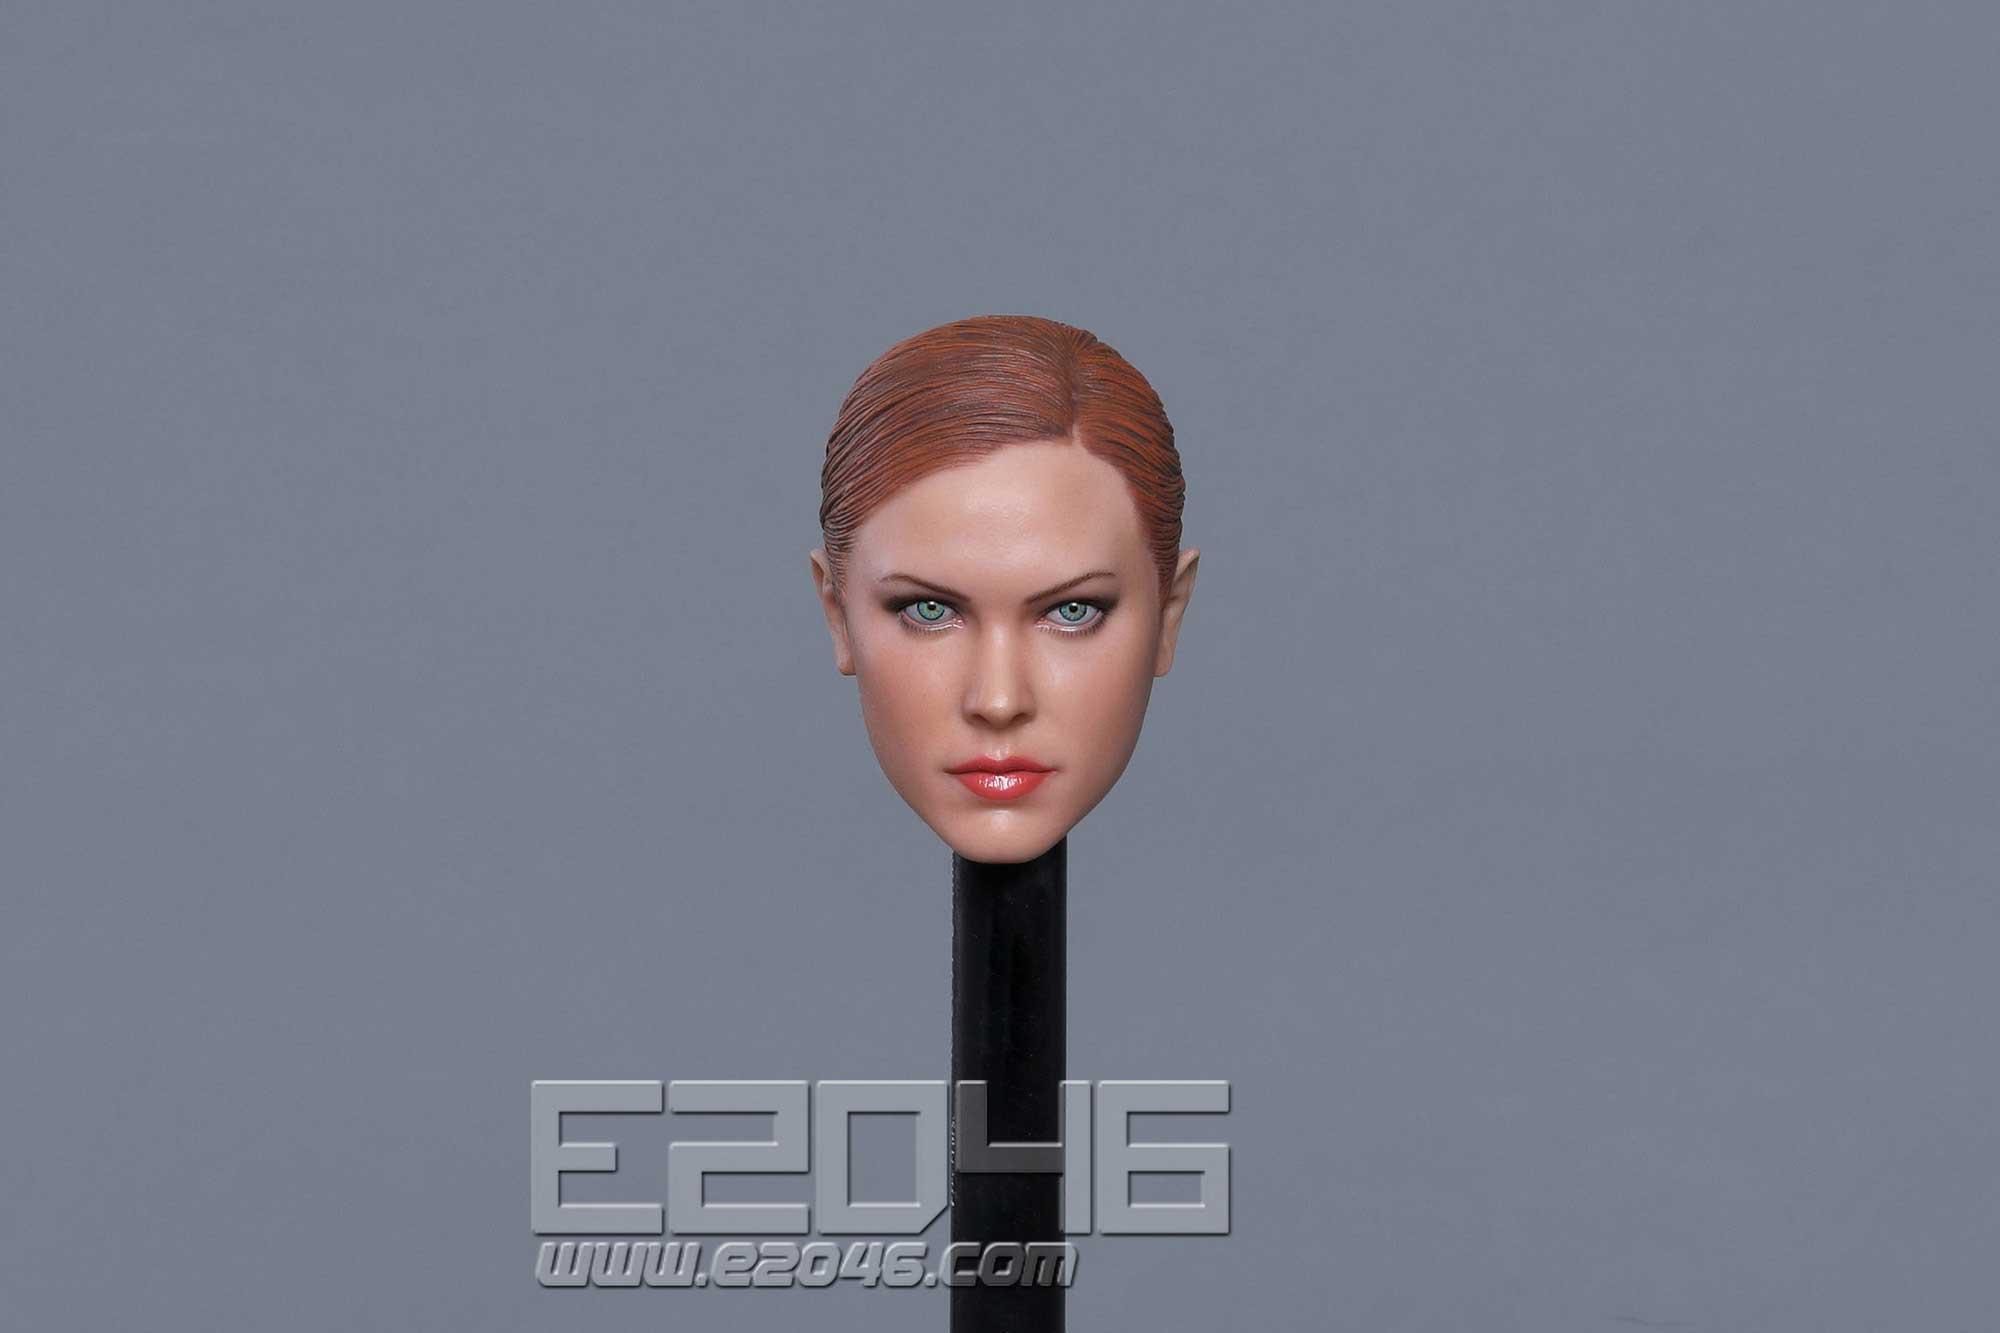 European beauty killer head A (DOLL)